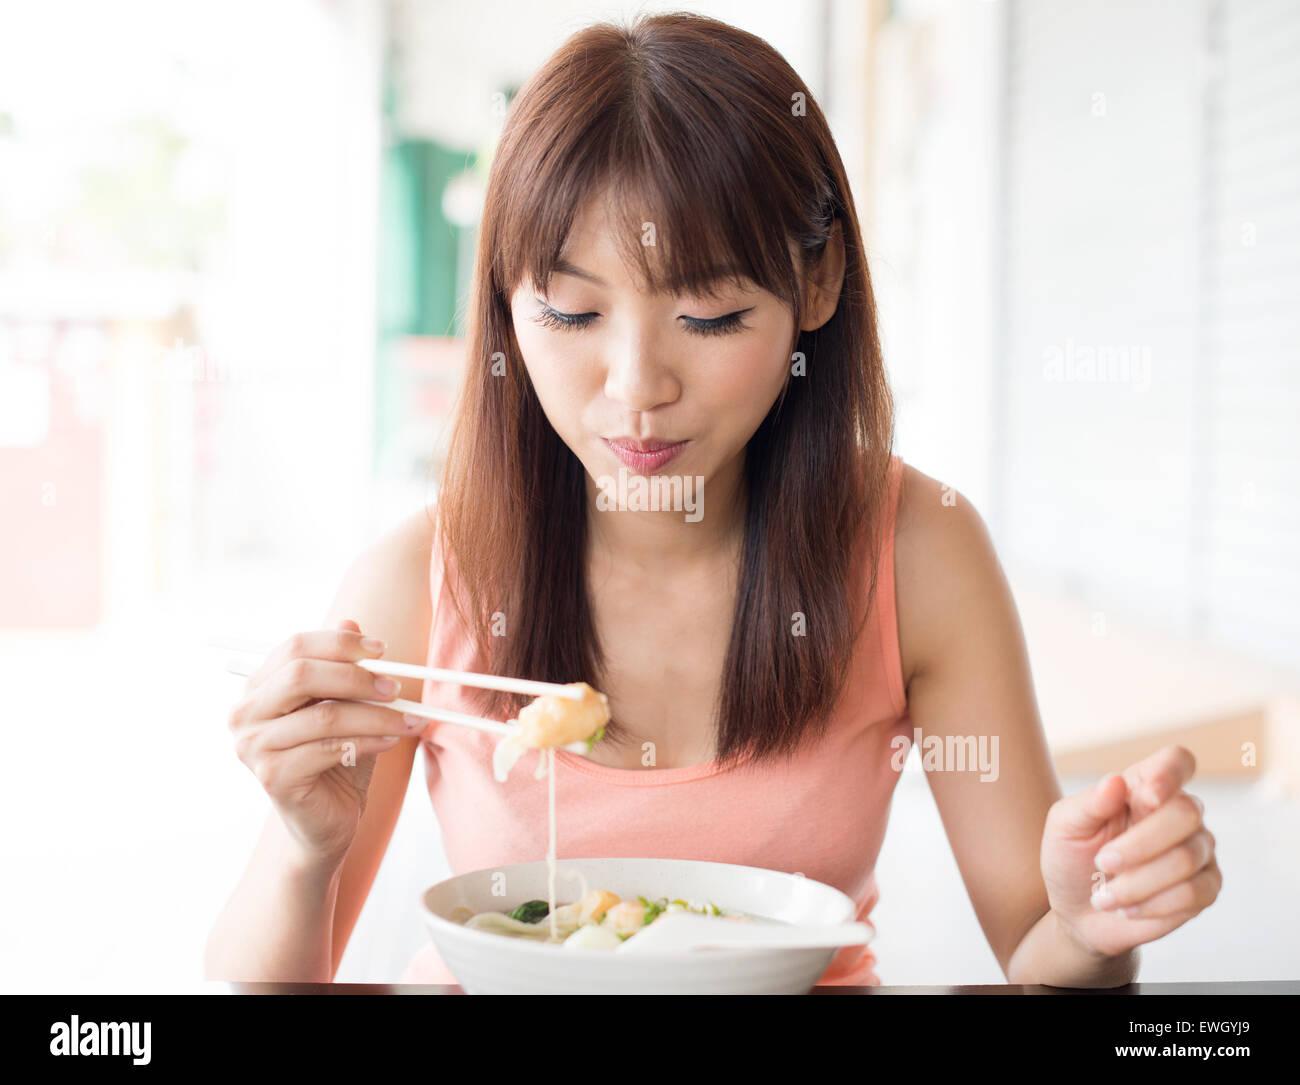 Asian Woman Eating 5